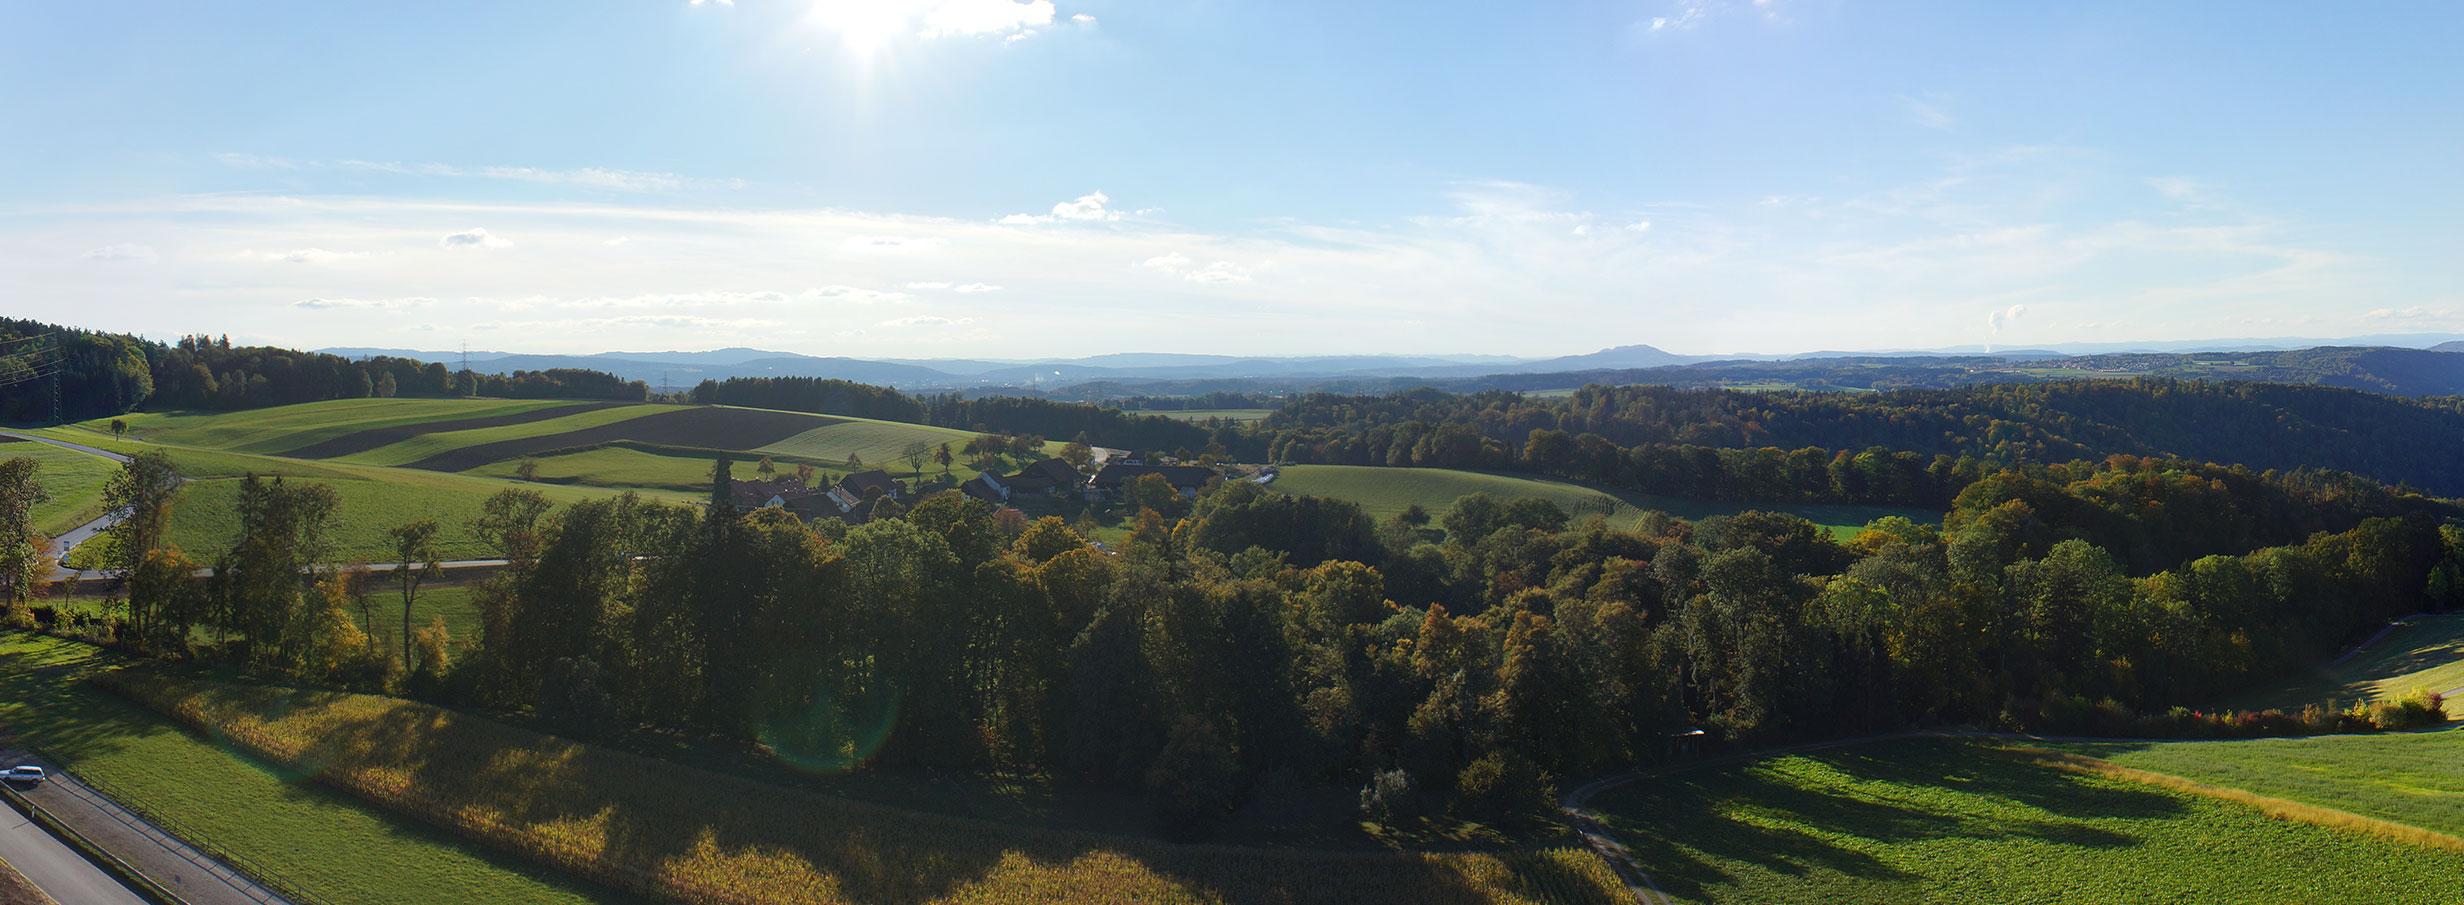 Drohne Luftaufnahmen Winterthur Kyburg Panorama 2